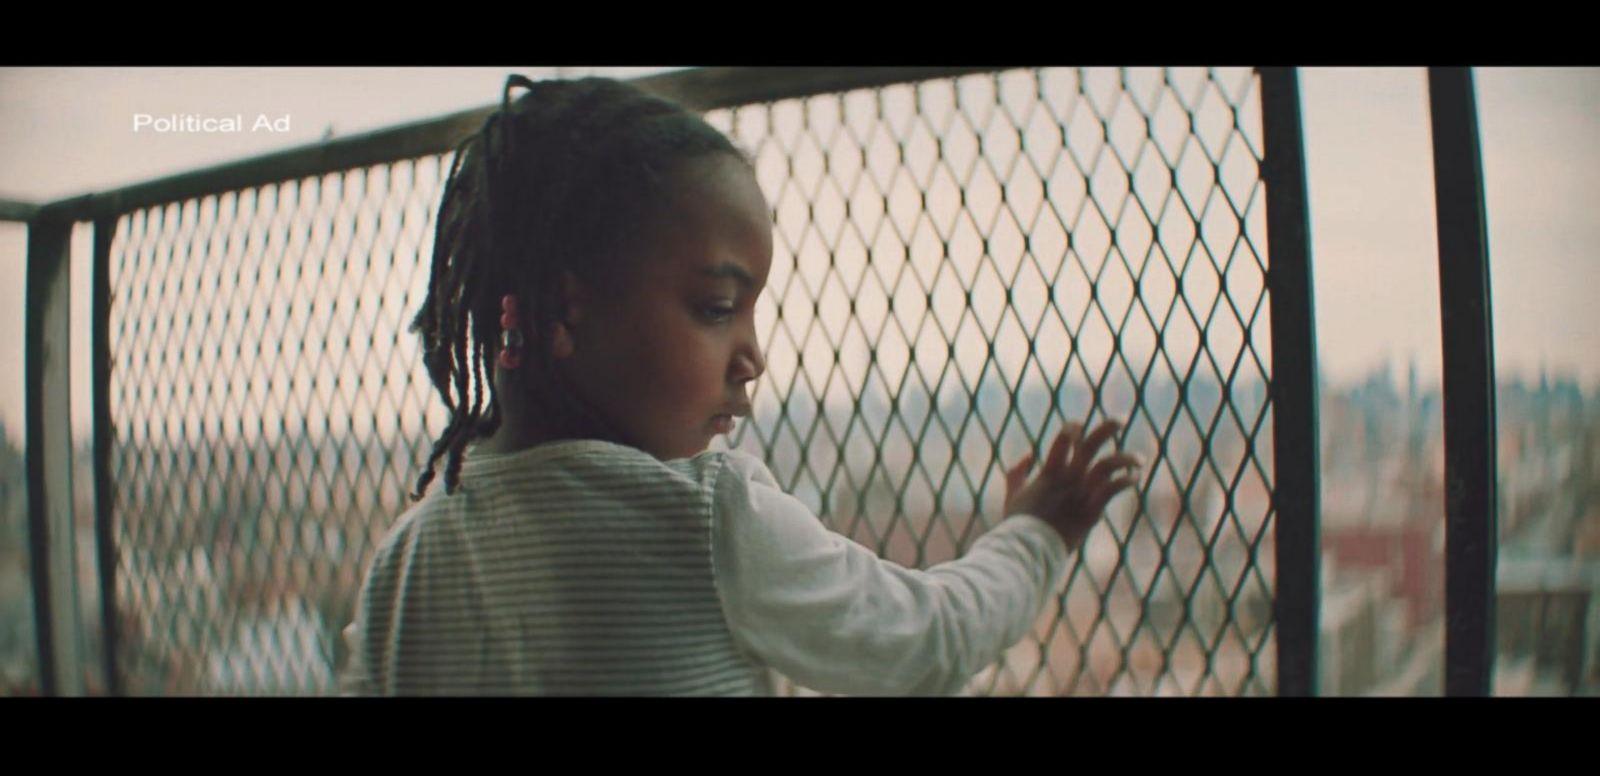 VIDEO: New Bernie Sanders Ad Features Eric Garner's Daughter